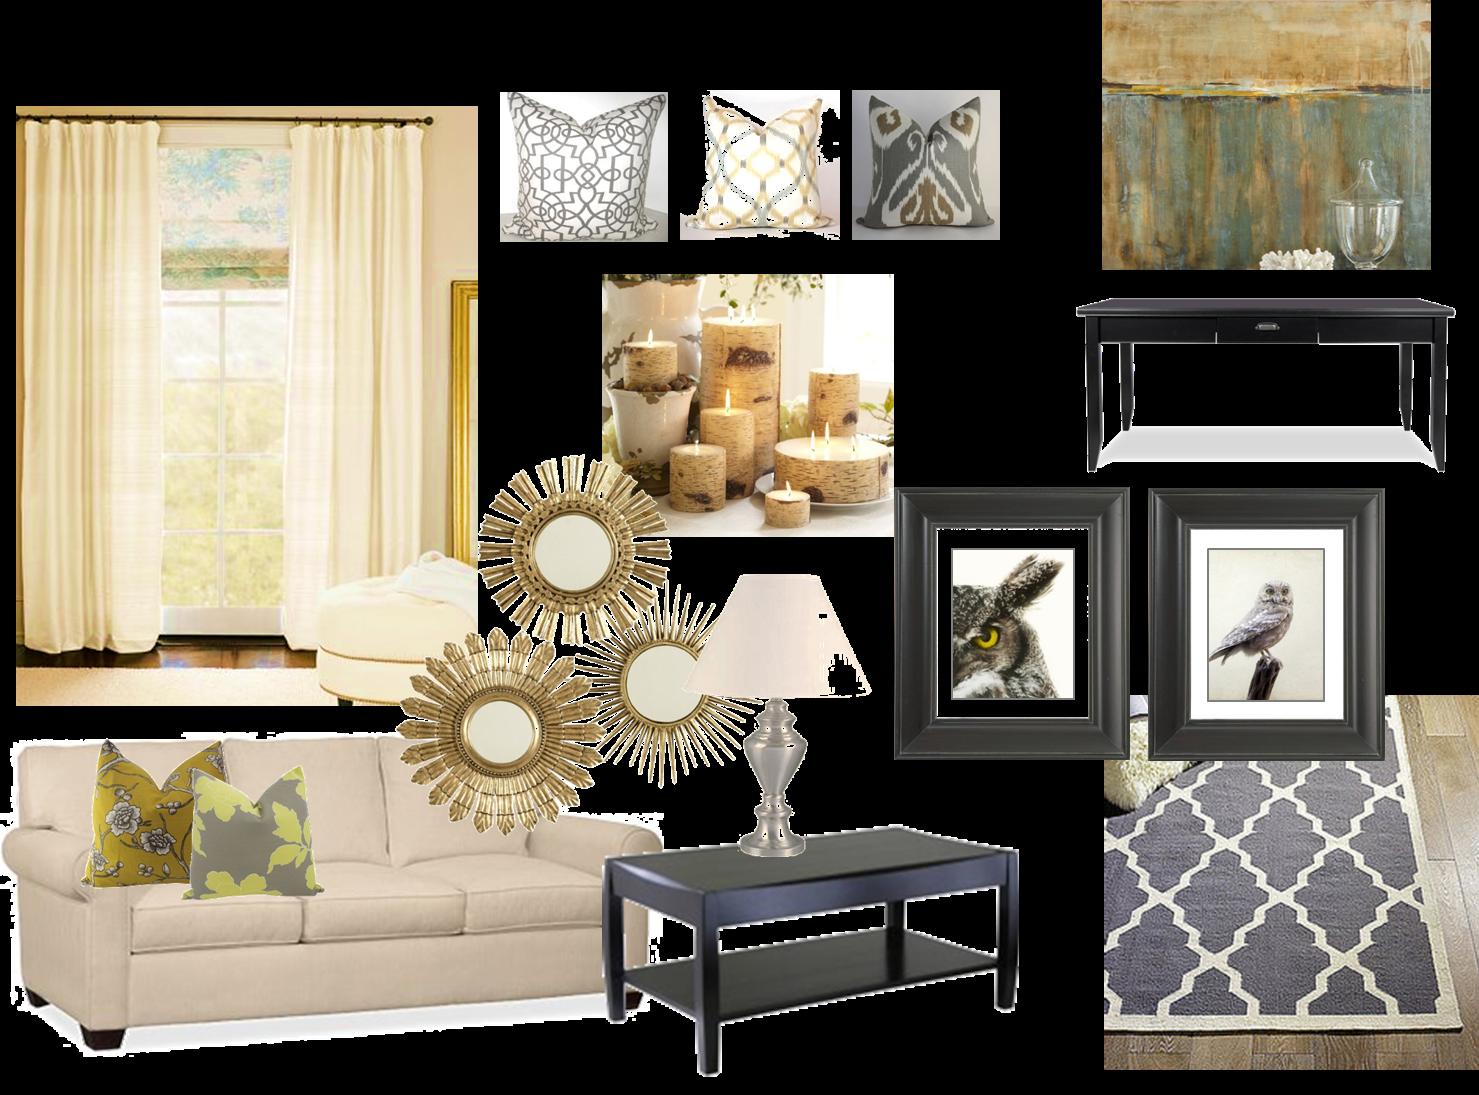 Cup Half Full: Home Decor - Living Room Inspiration